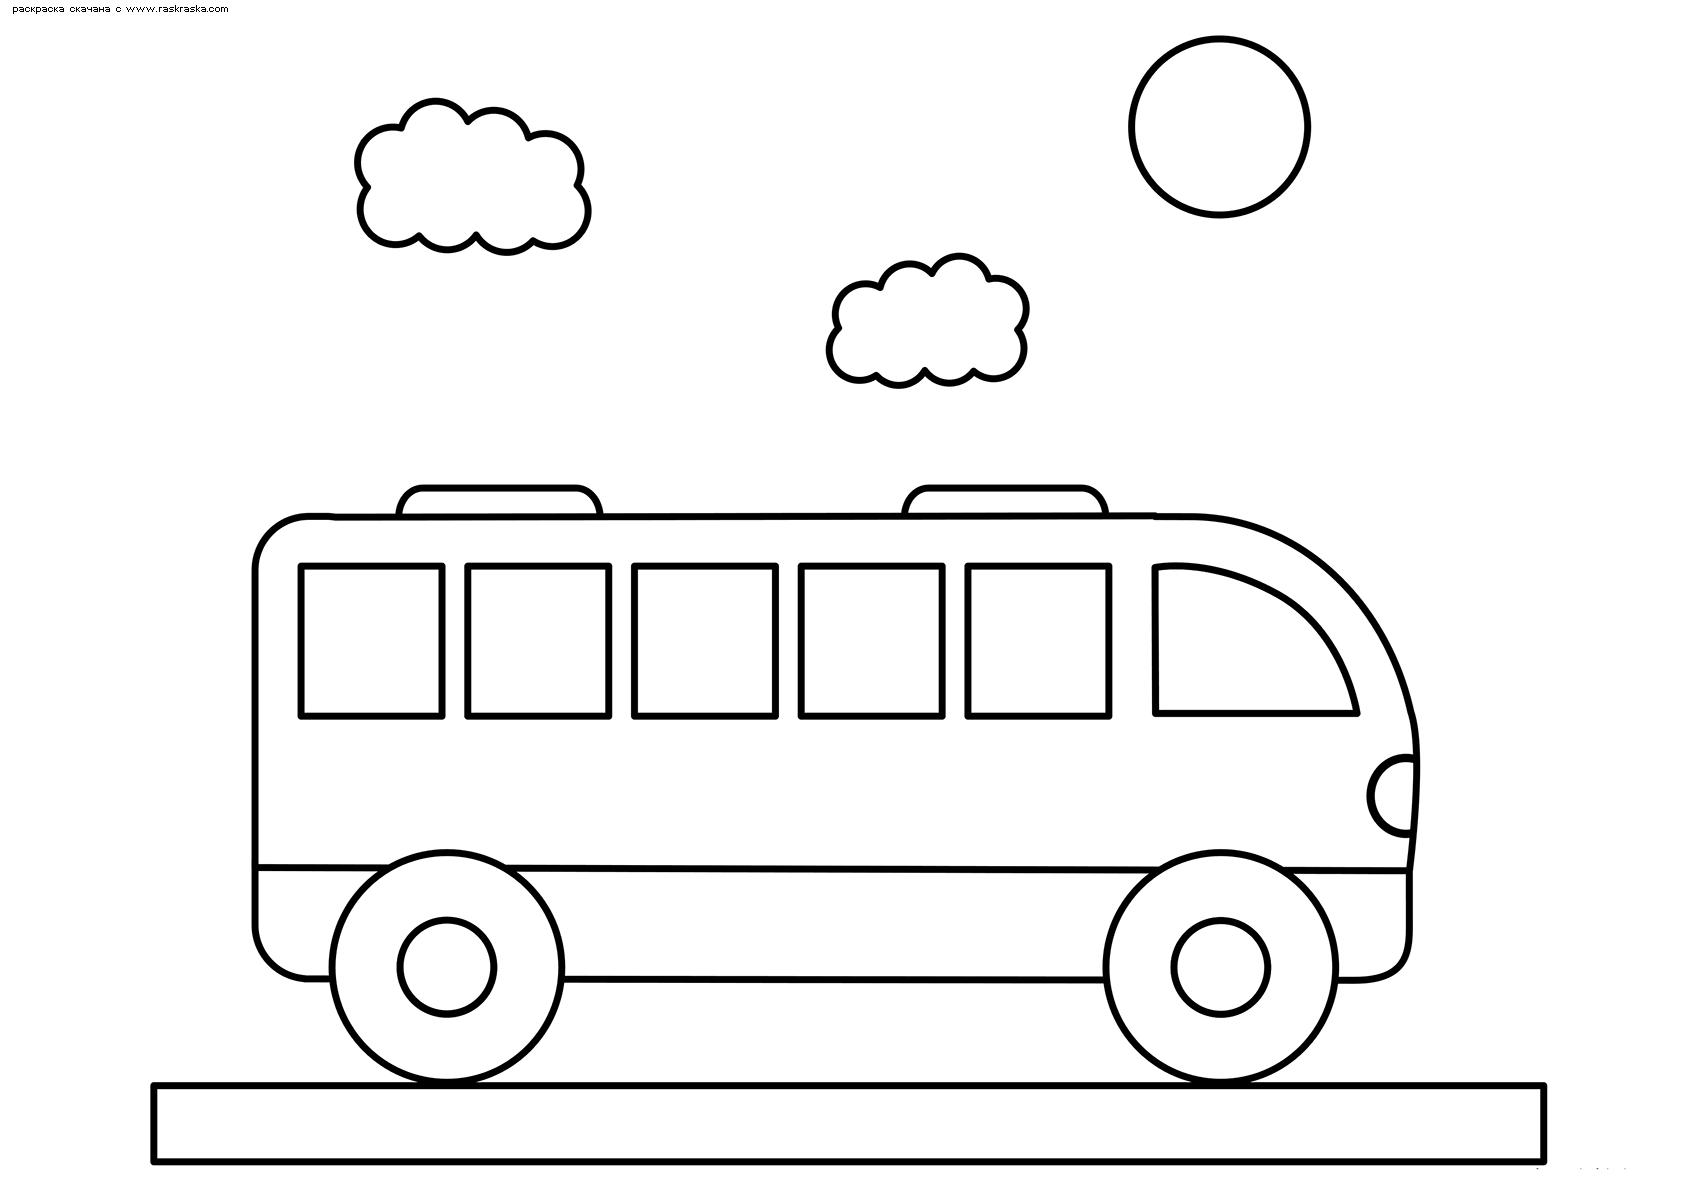 Раскраска Автобус. Раскраска автобус